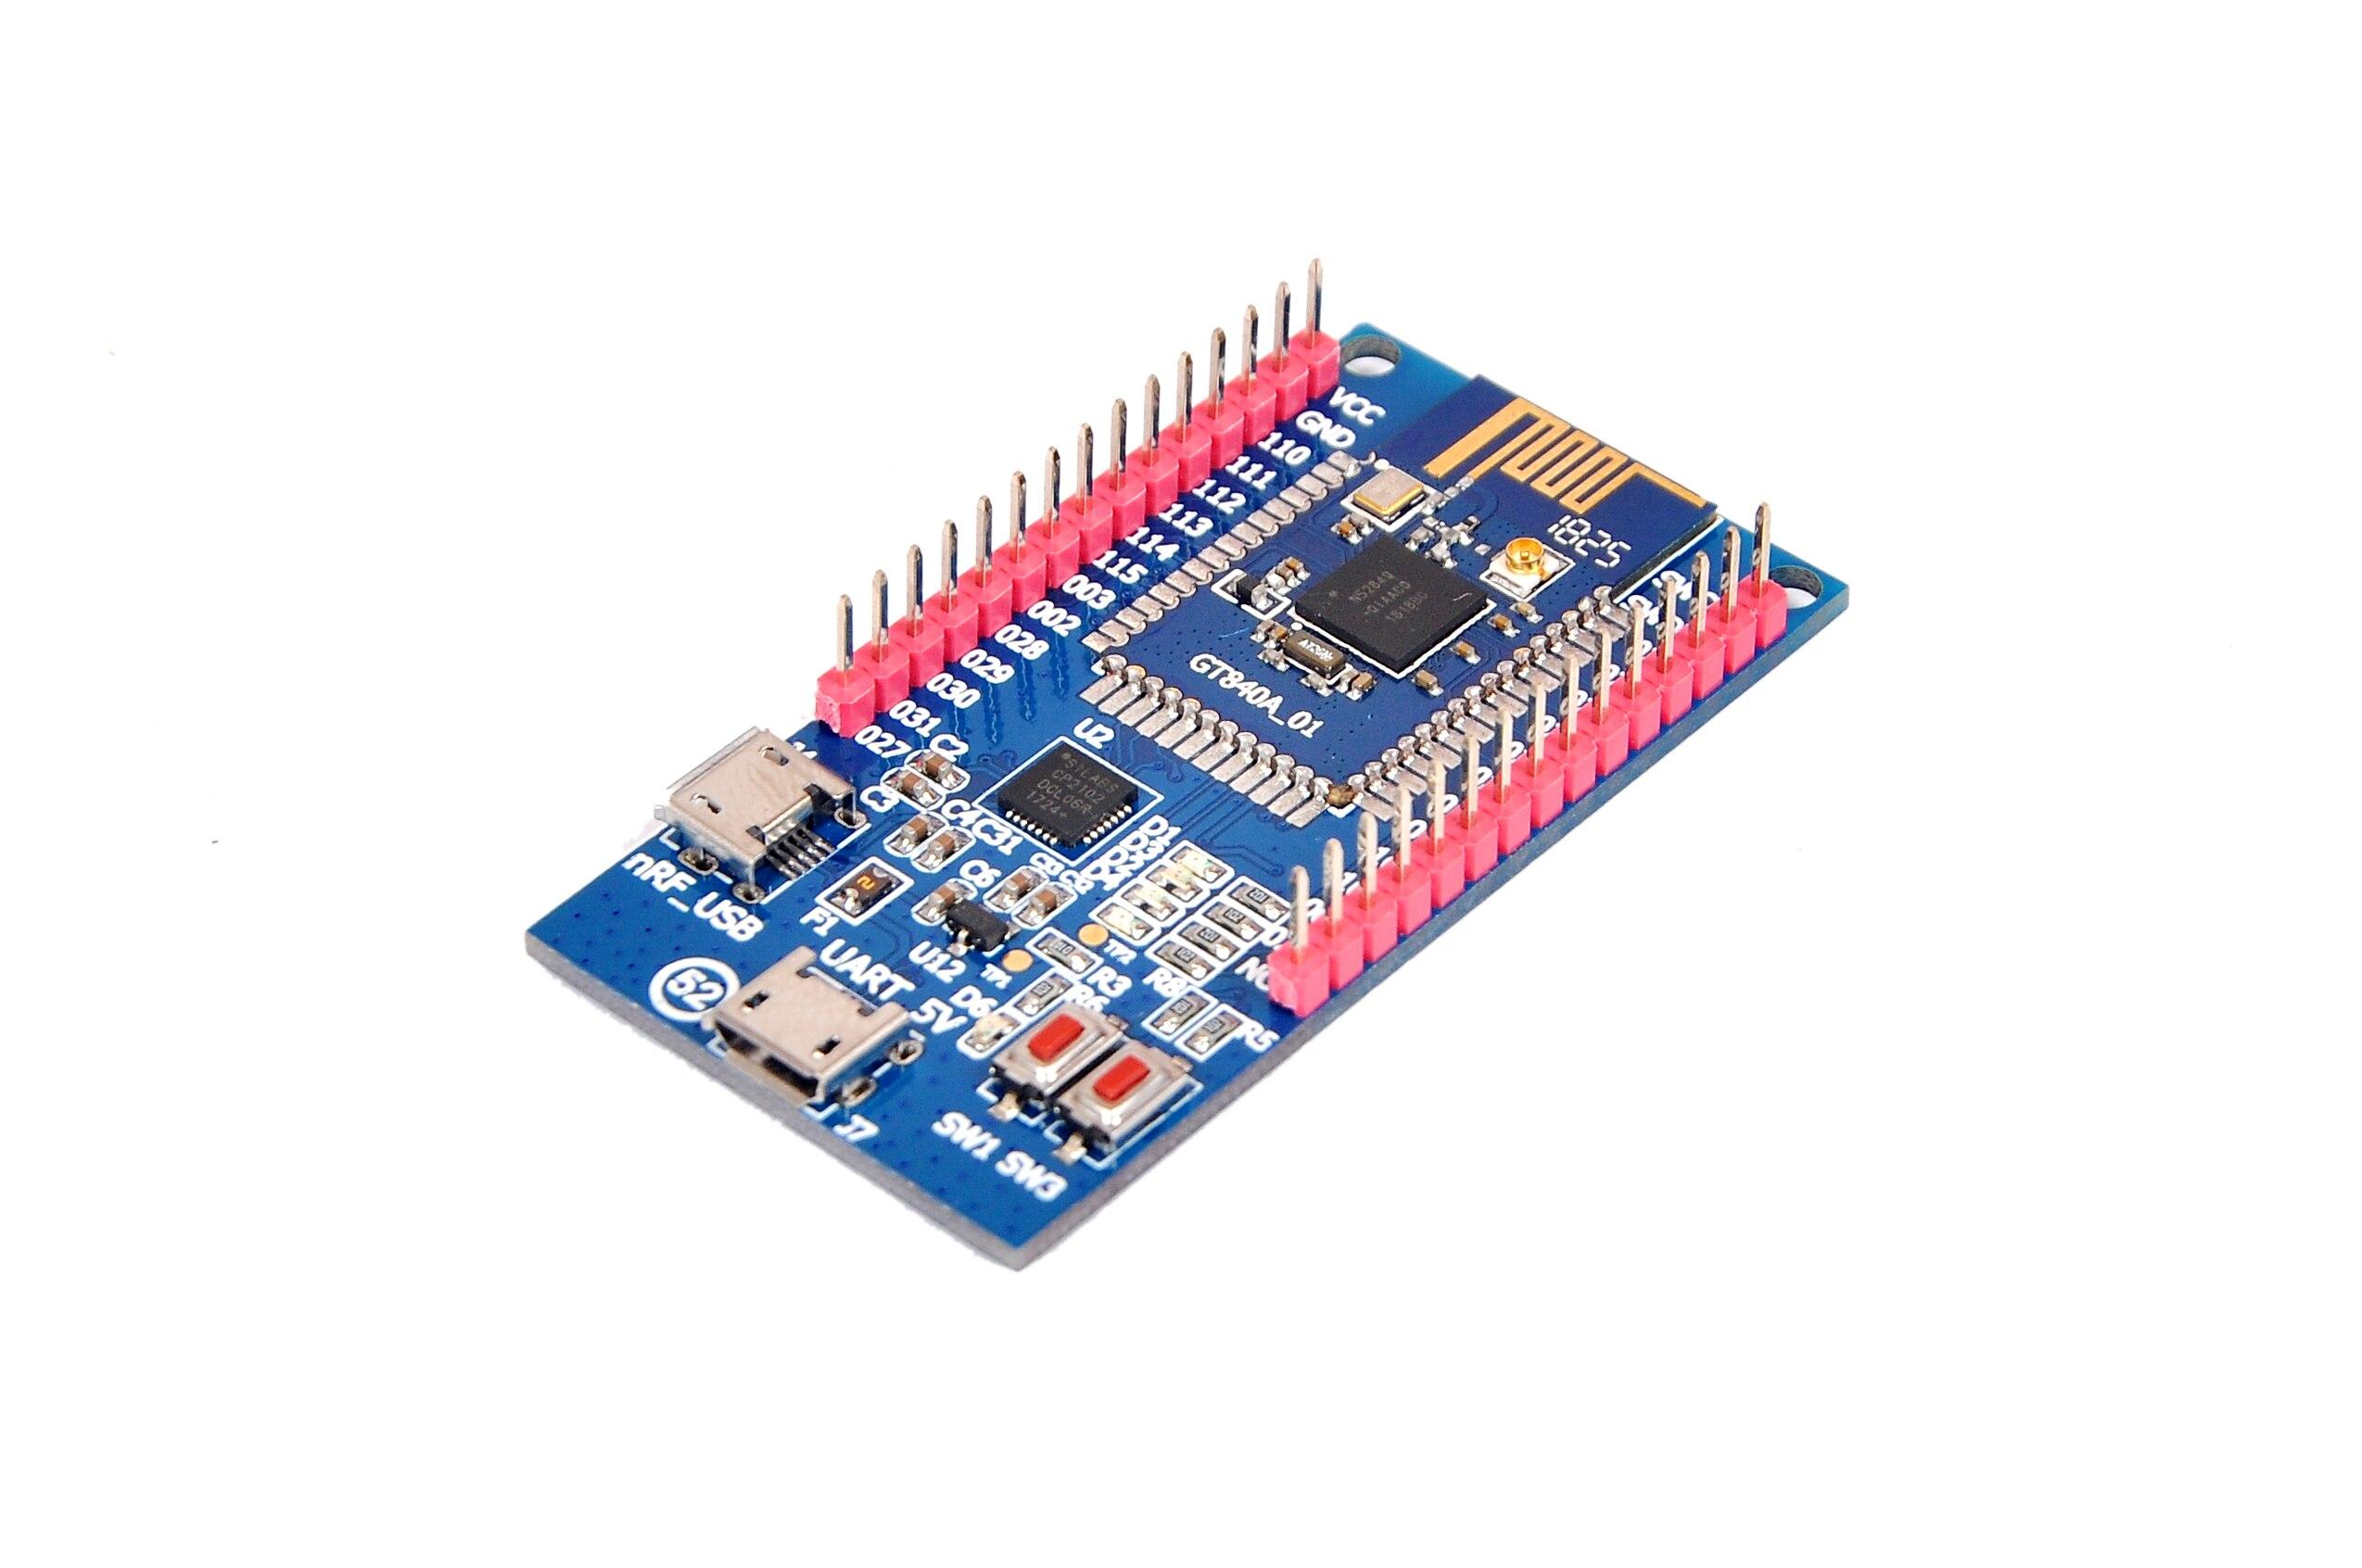 NRF52840 panneau de développement Bluetooth 5 maille ZIGBEE Bluetooth basse énergie